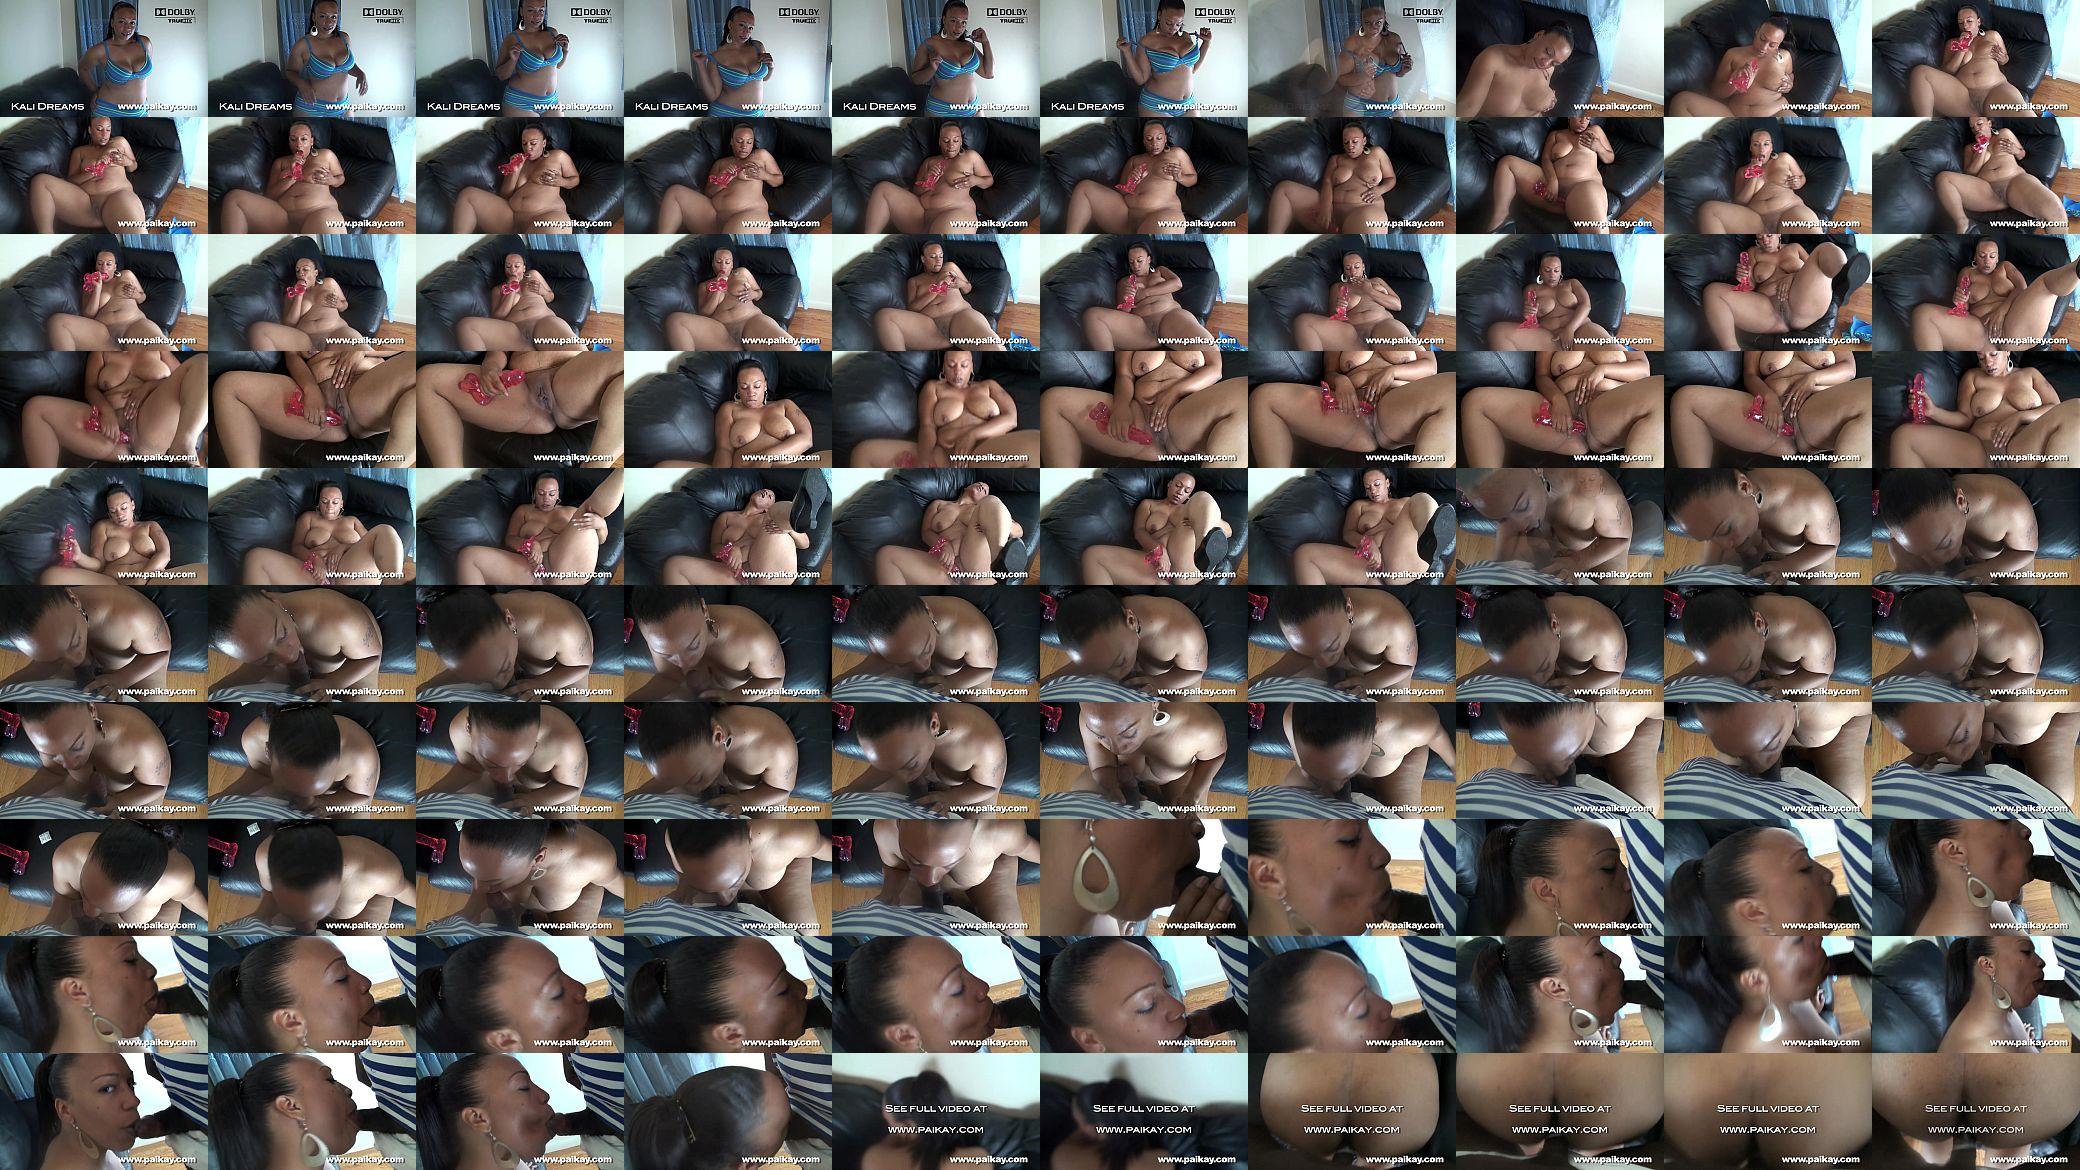 Agulaira nude pics